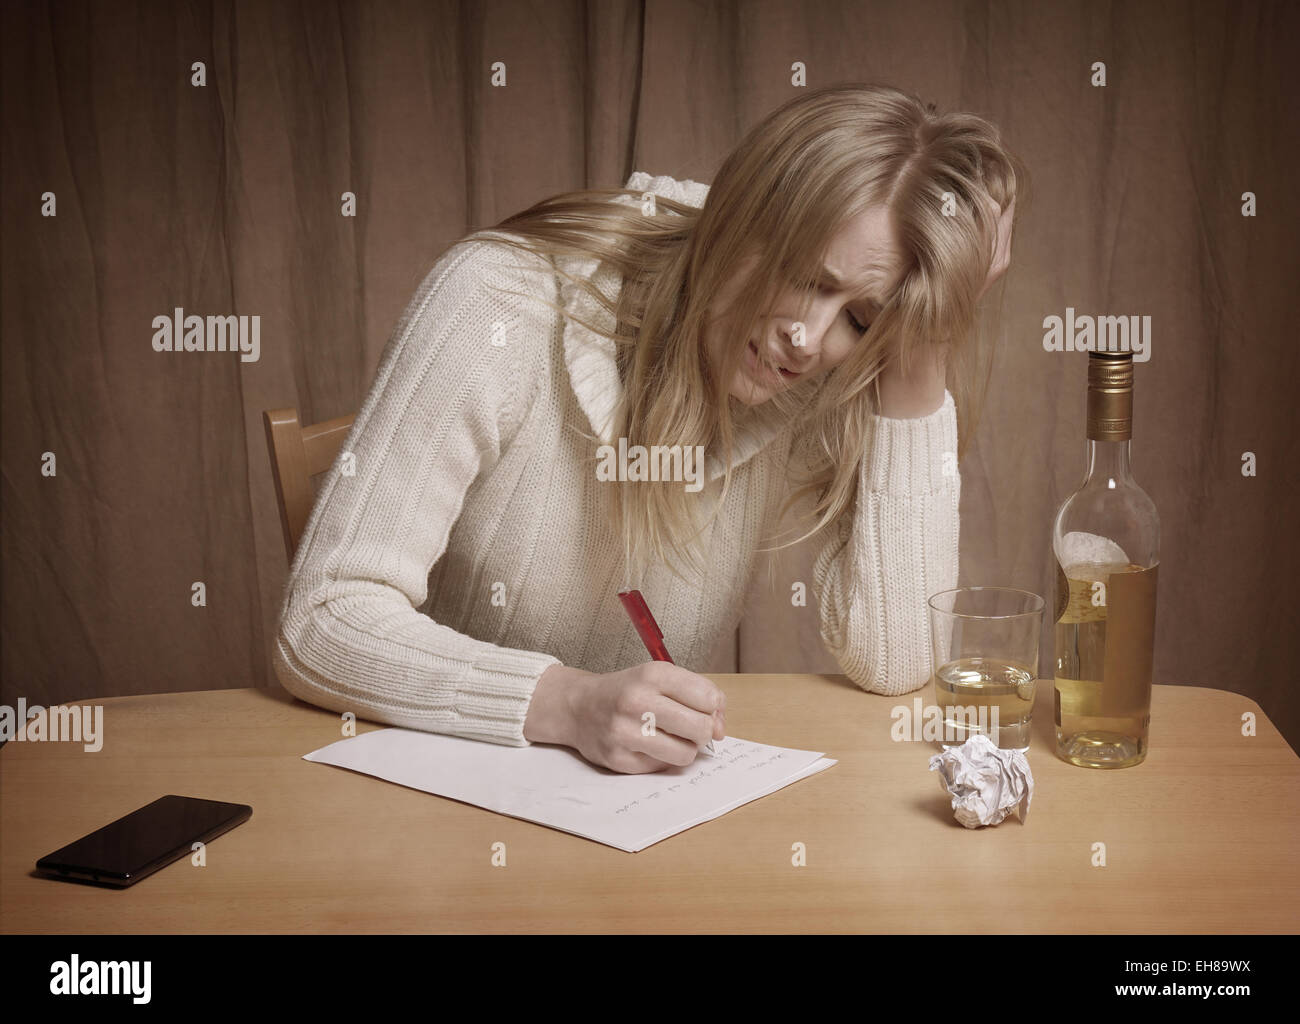 Liebeskummer Hat Frau Stockfoto Bild 79474022 Alamy